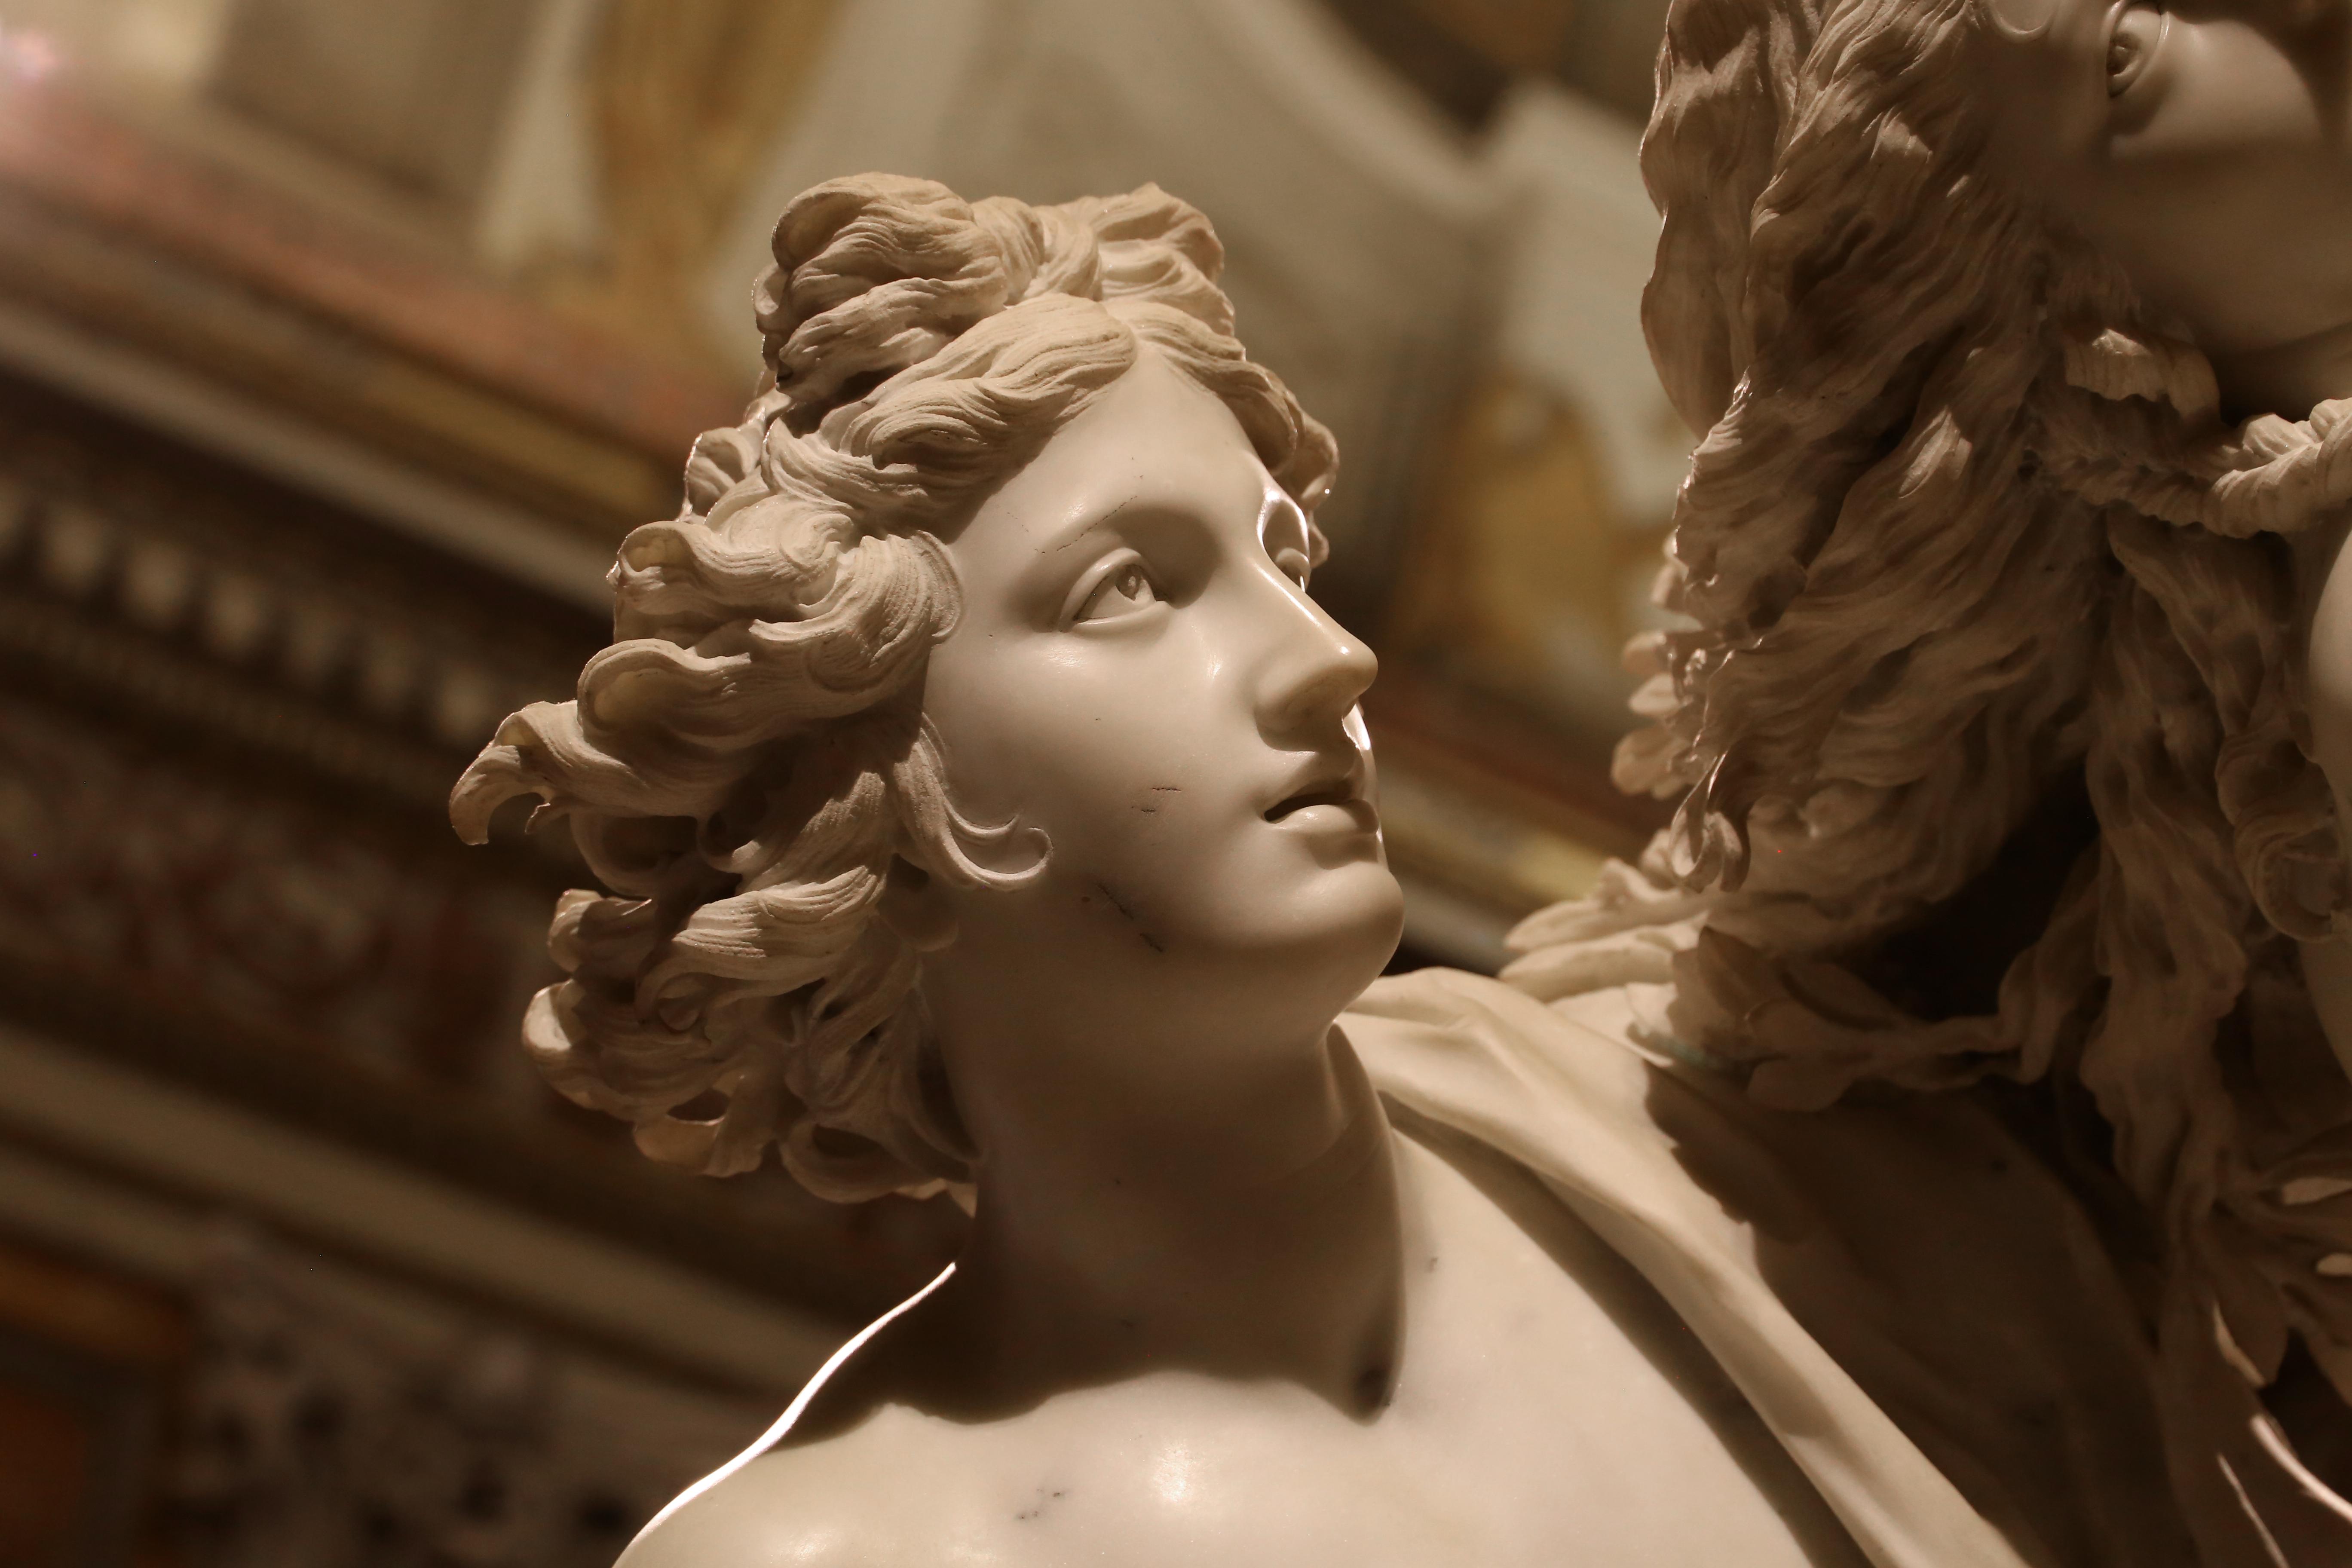 File:Gianlorenzo bernini, apollo e adfne, marmo, 1622-25, 03 jpg